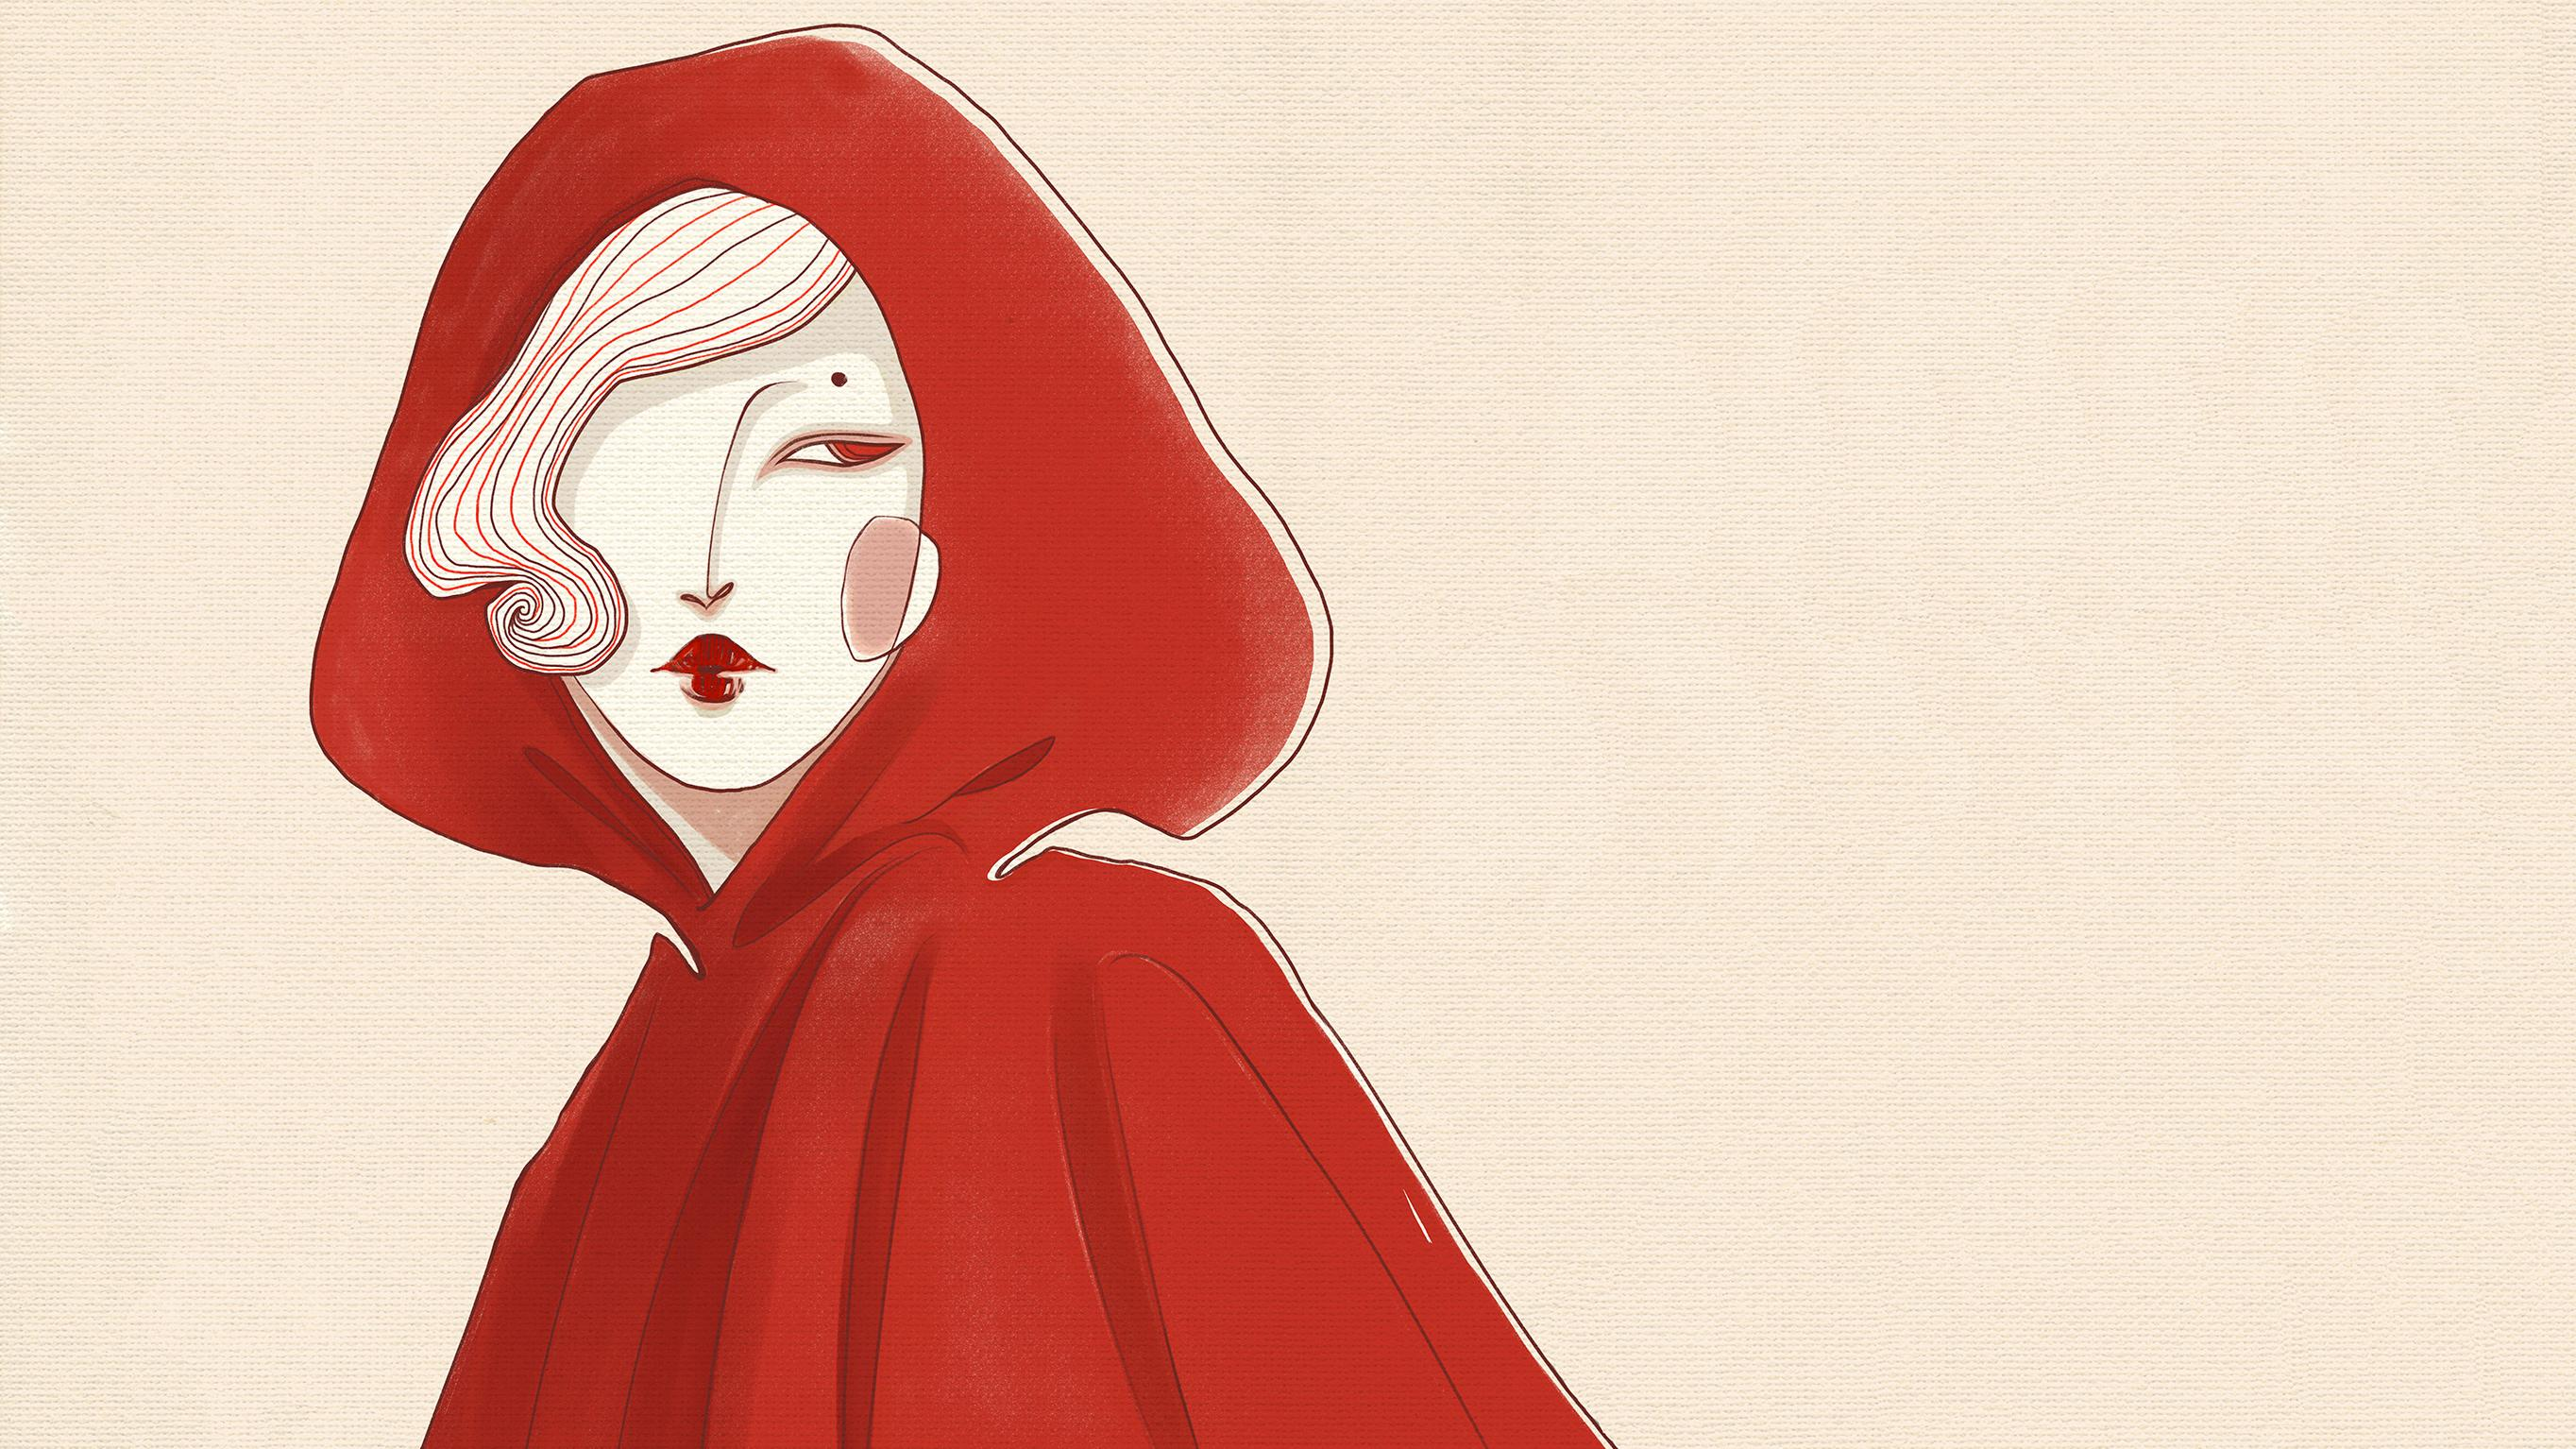 Sex, anger, lust, danger: the semiotics of scarlet